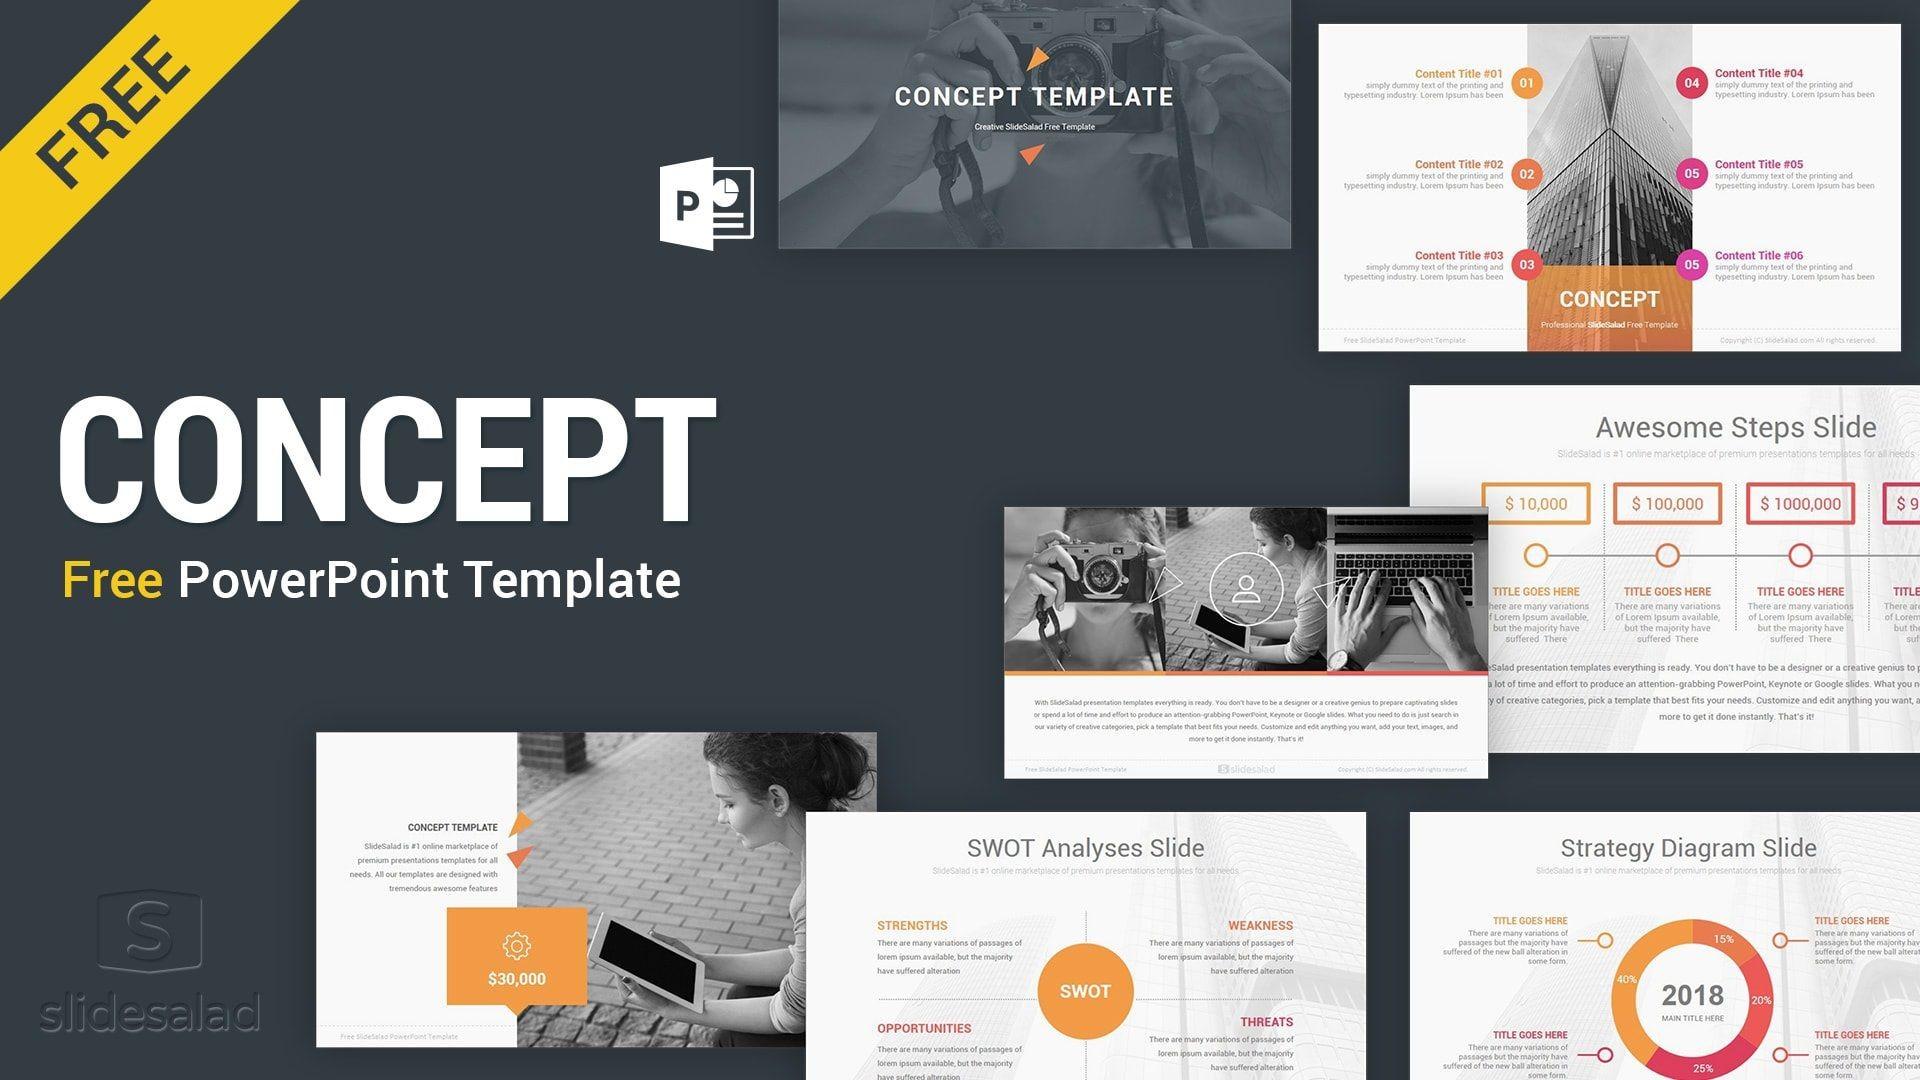 004 Singular Product Presentation Ppt Template Free Download Design 1920